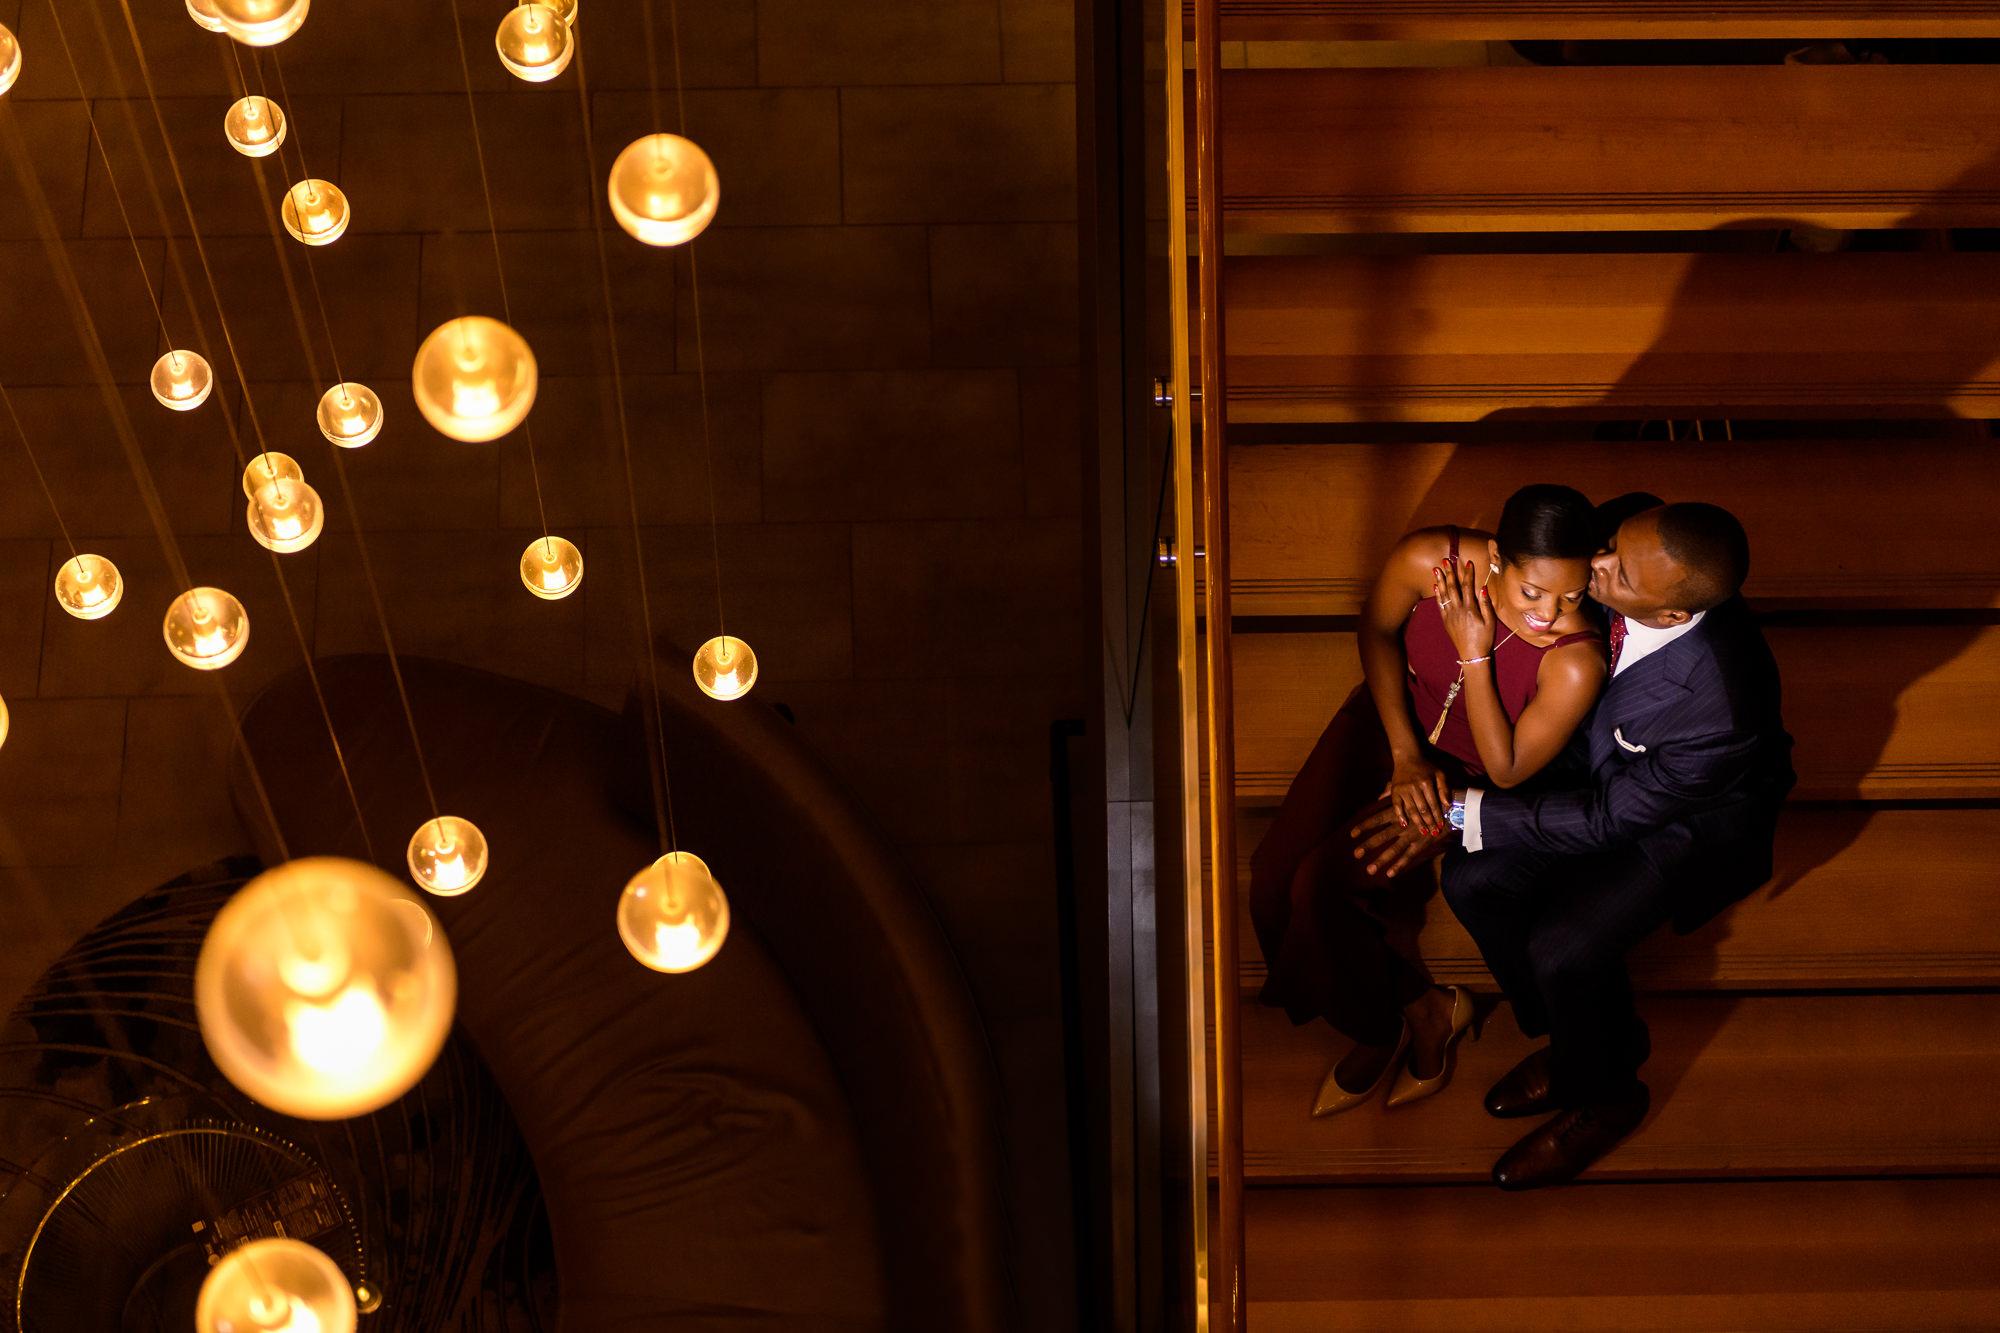 015-christopher-jason-studios-washington-dc-wharf-engagement-session-nigerian-couple-embraces-in-atrium.jpg